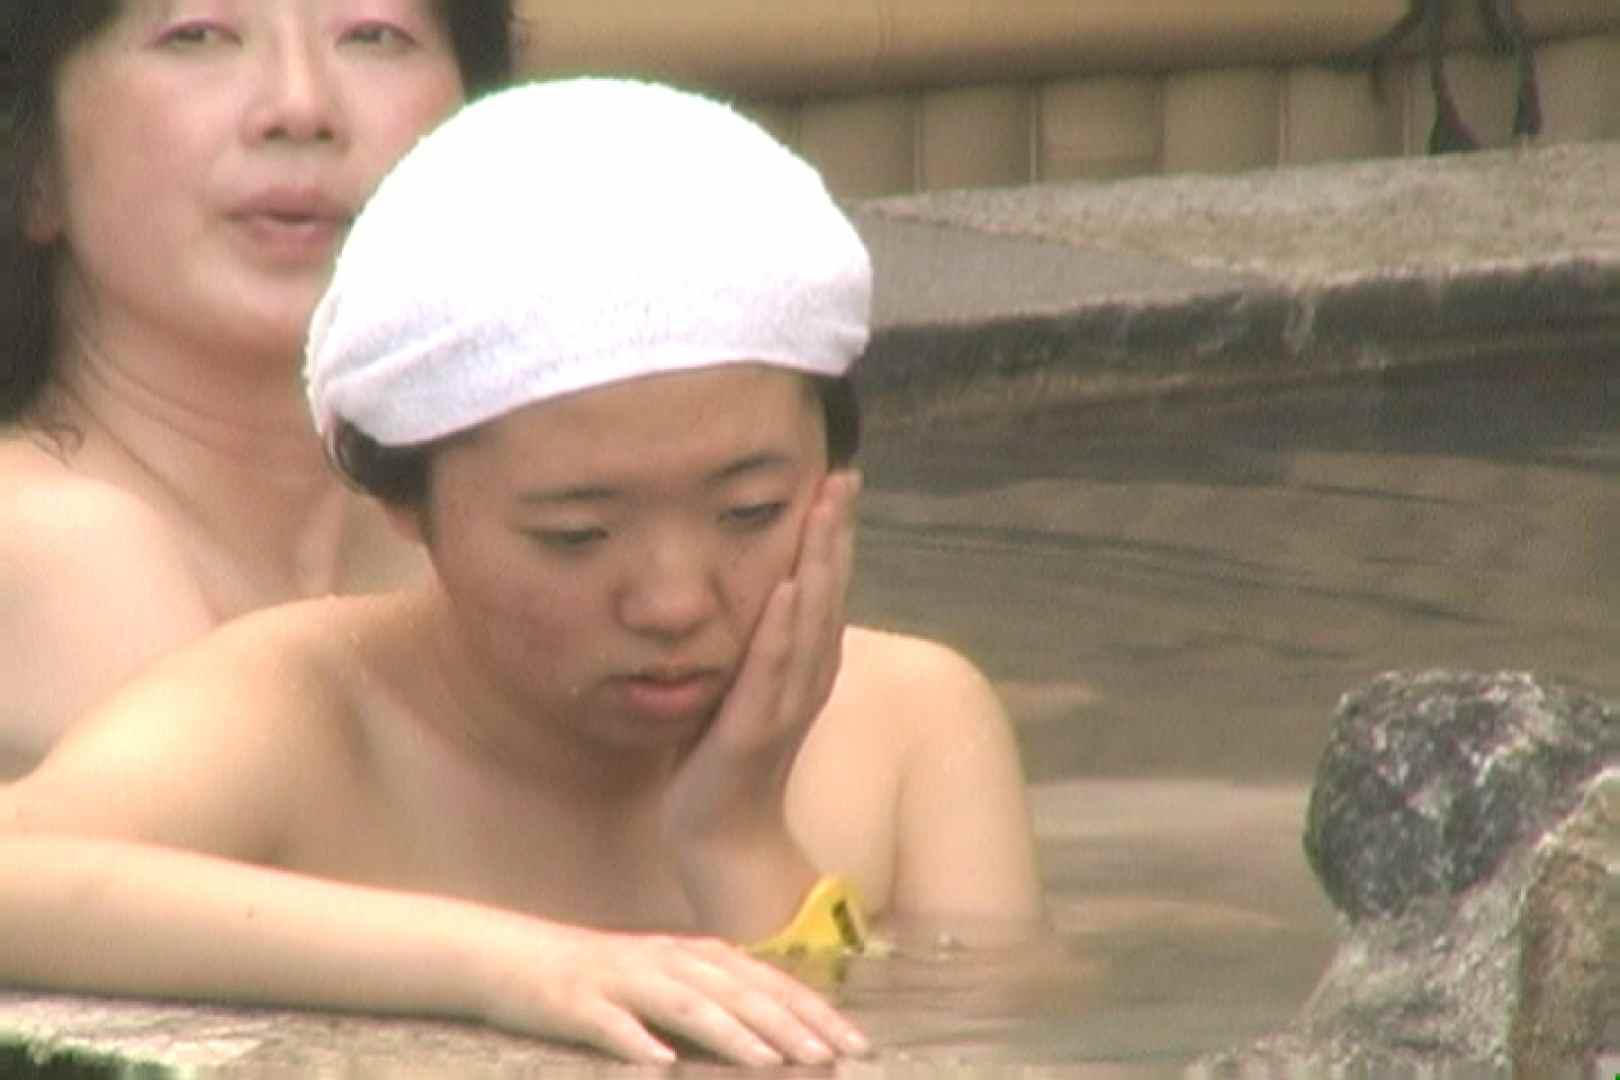 Aquaな露天風呂Vol.627 盗撮大放出 われめAV動画紹介 92連発 30